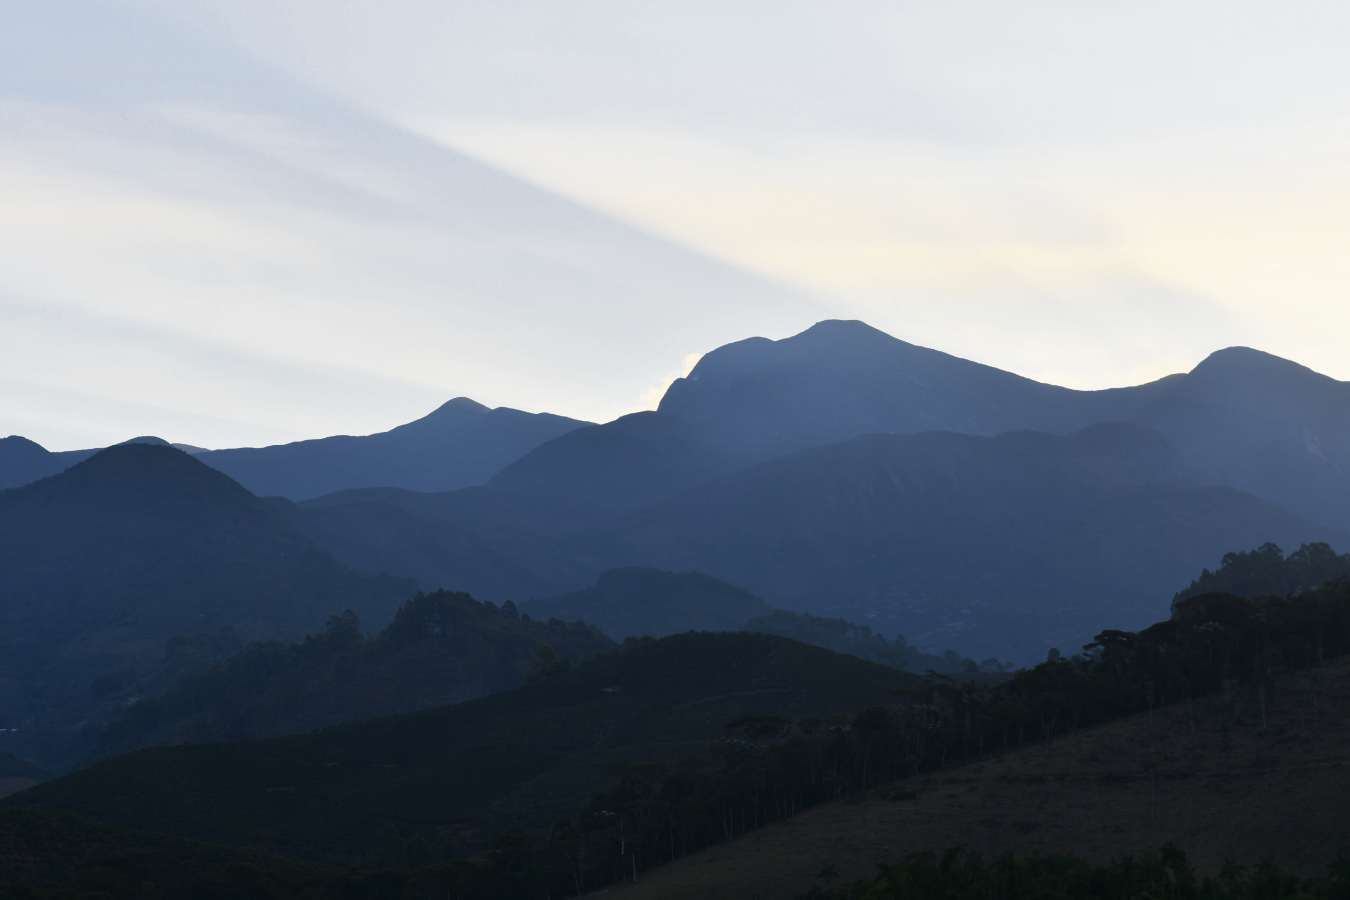 Vista da Serra do Caparaó no lado capixaba. Dá para ver o pico da bandeira da estrada . Crédito: Edson Chagas